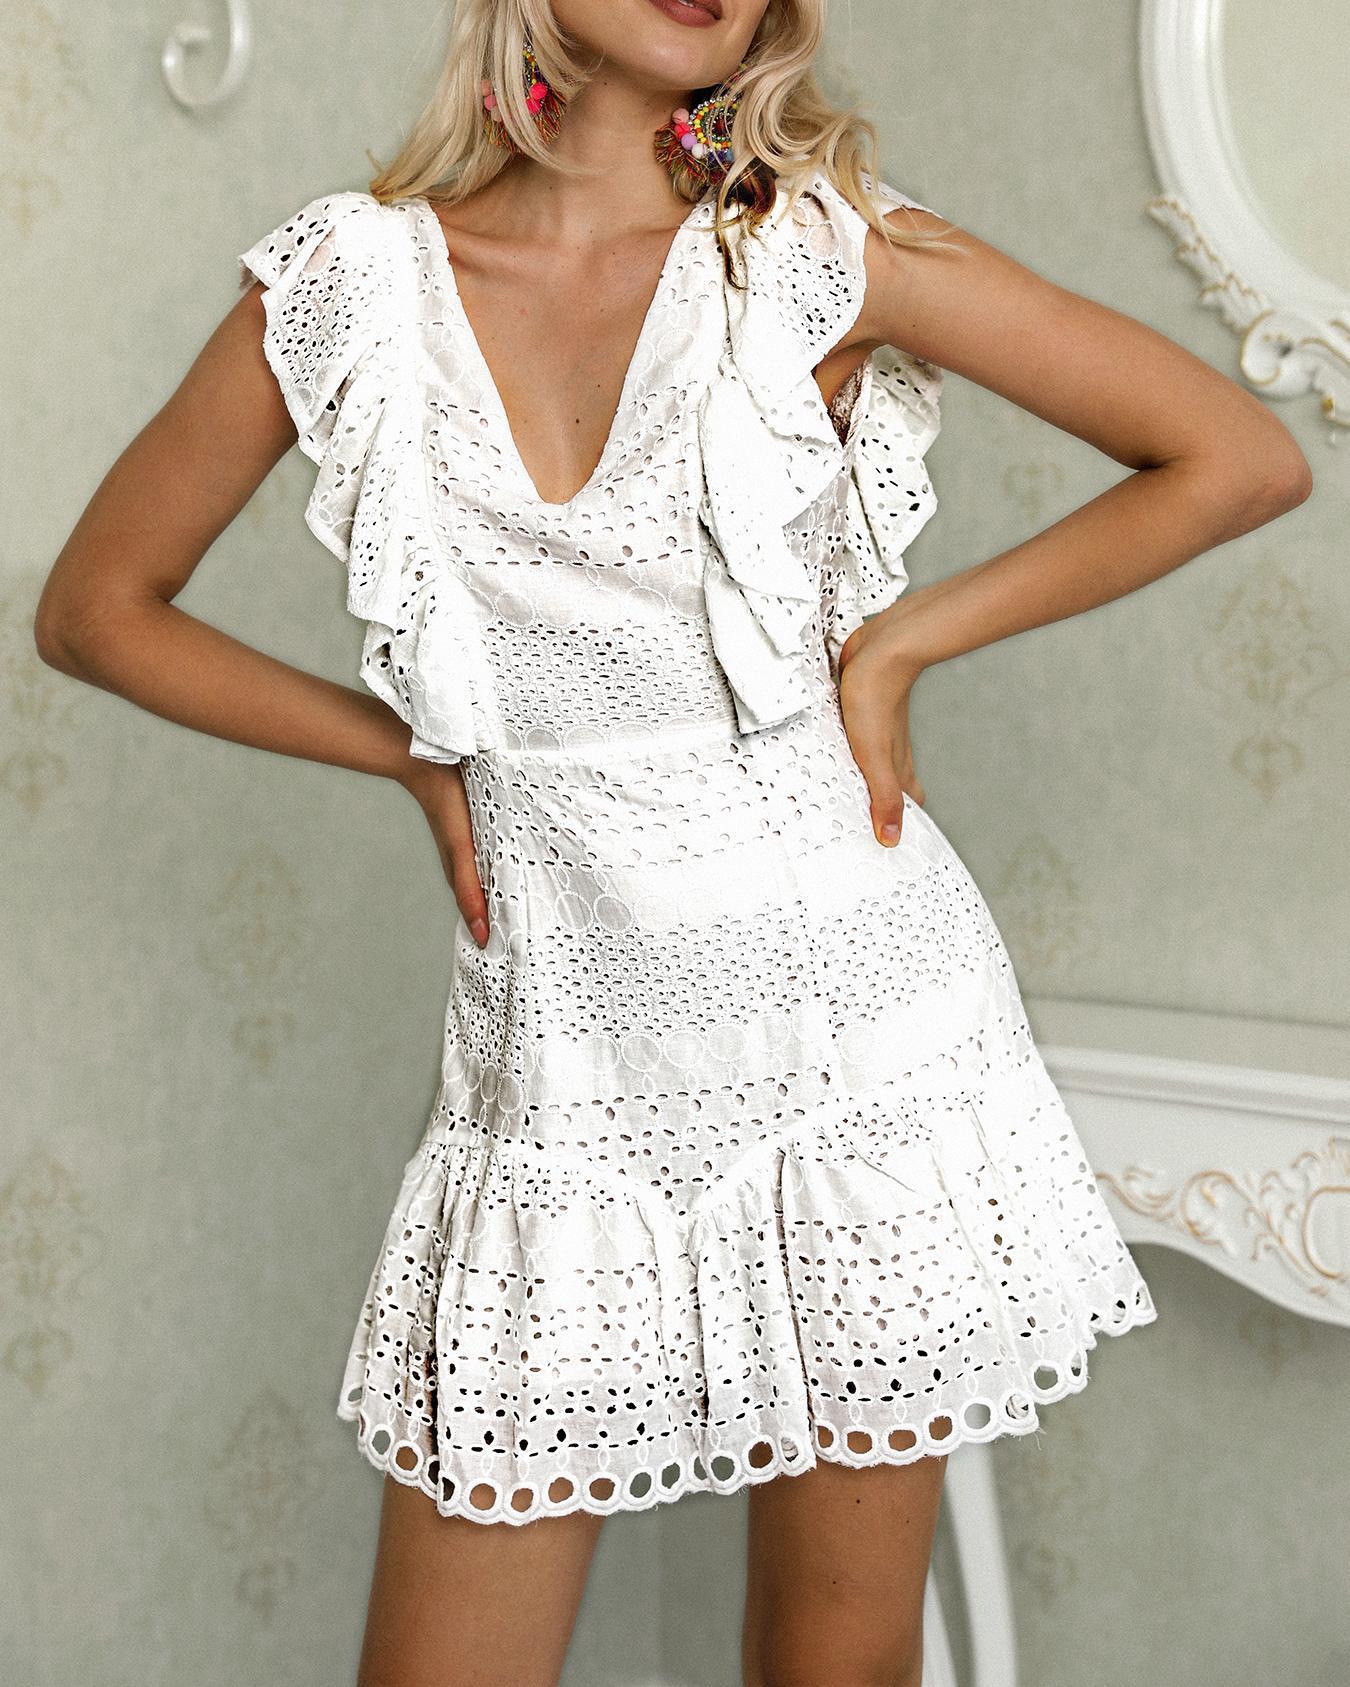 boutiquefeel / Oco Out Trim Ruffles Mini Vestido Sólido